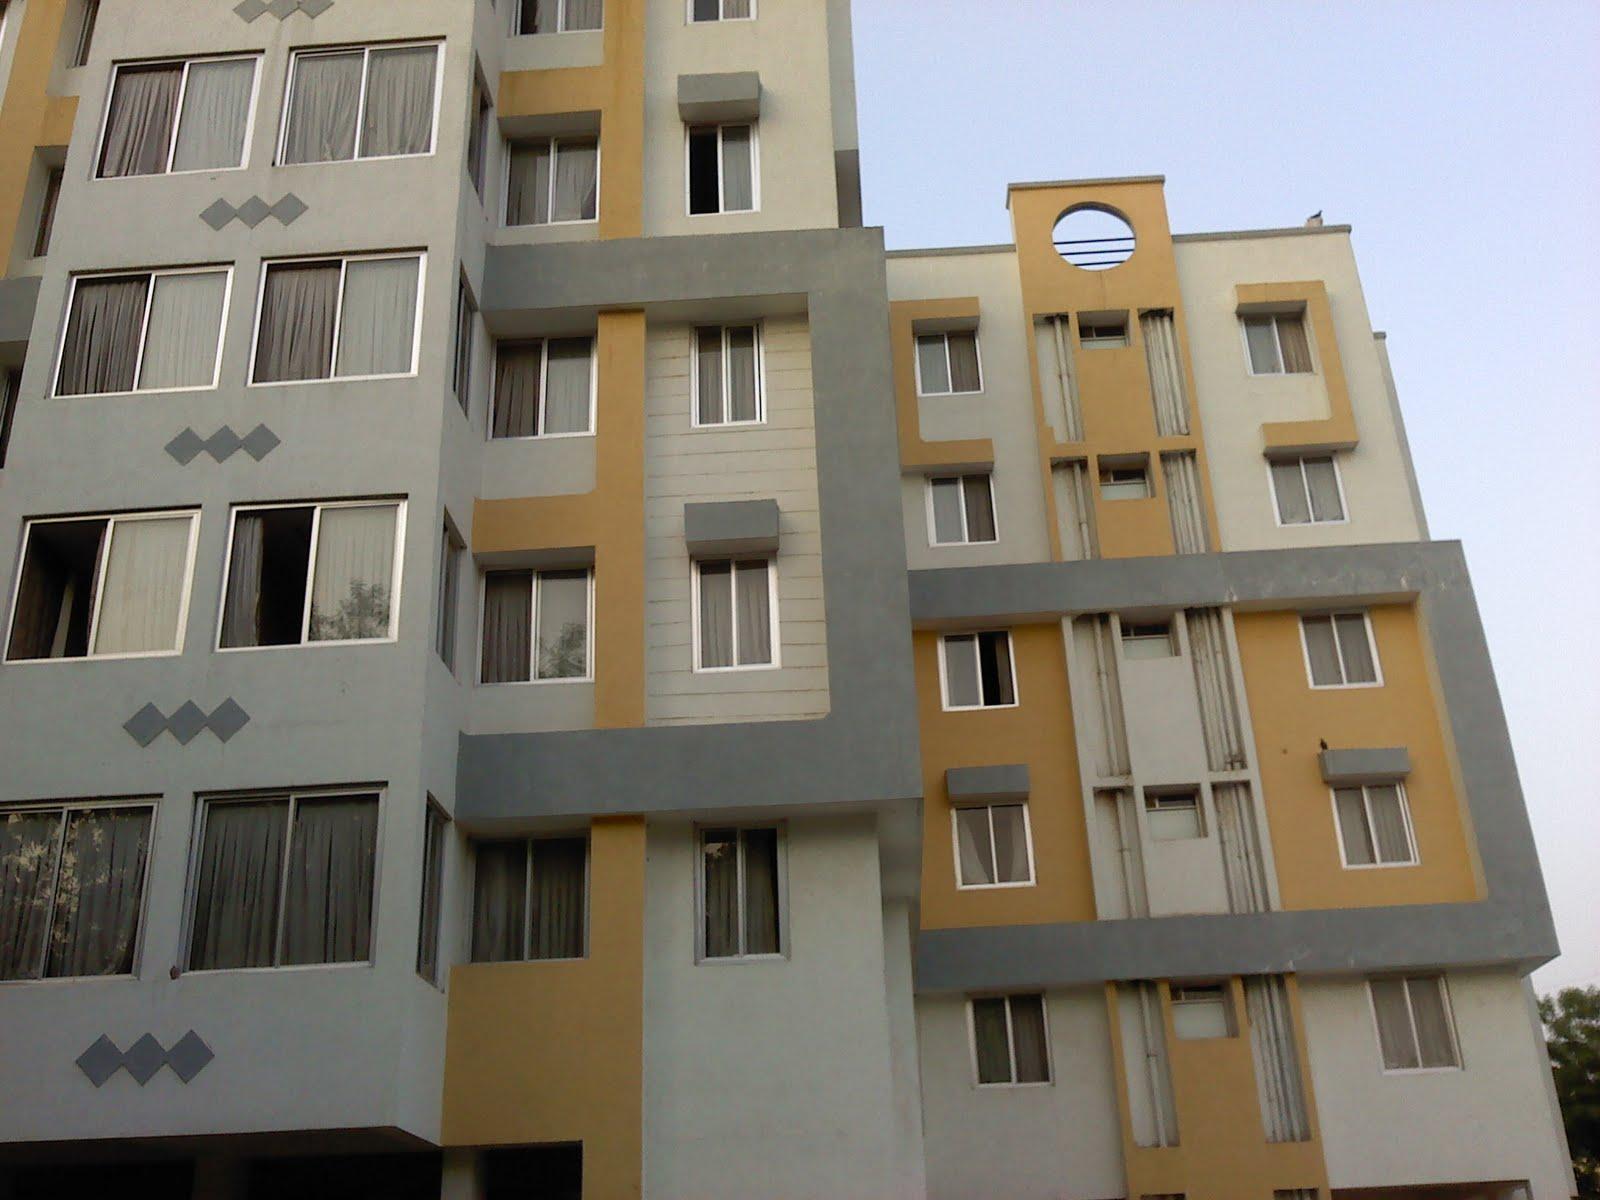 Studio Apartment Ahmedabad Tcs the great indian it industry: rememering tcs ilp gandhinagar days